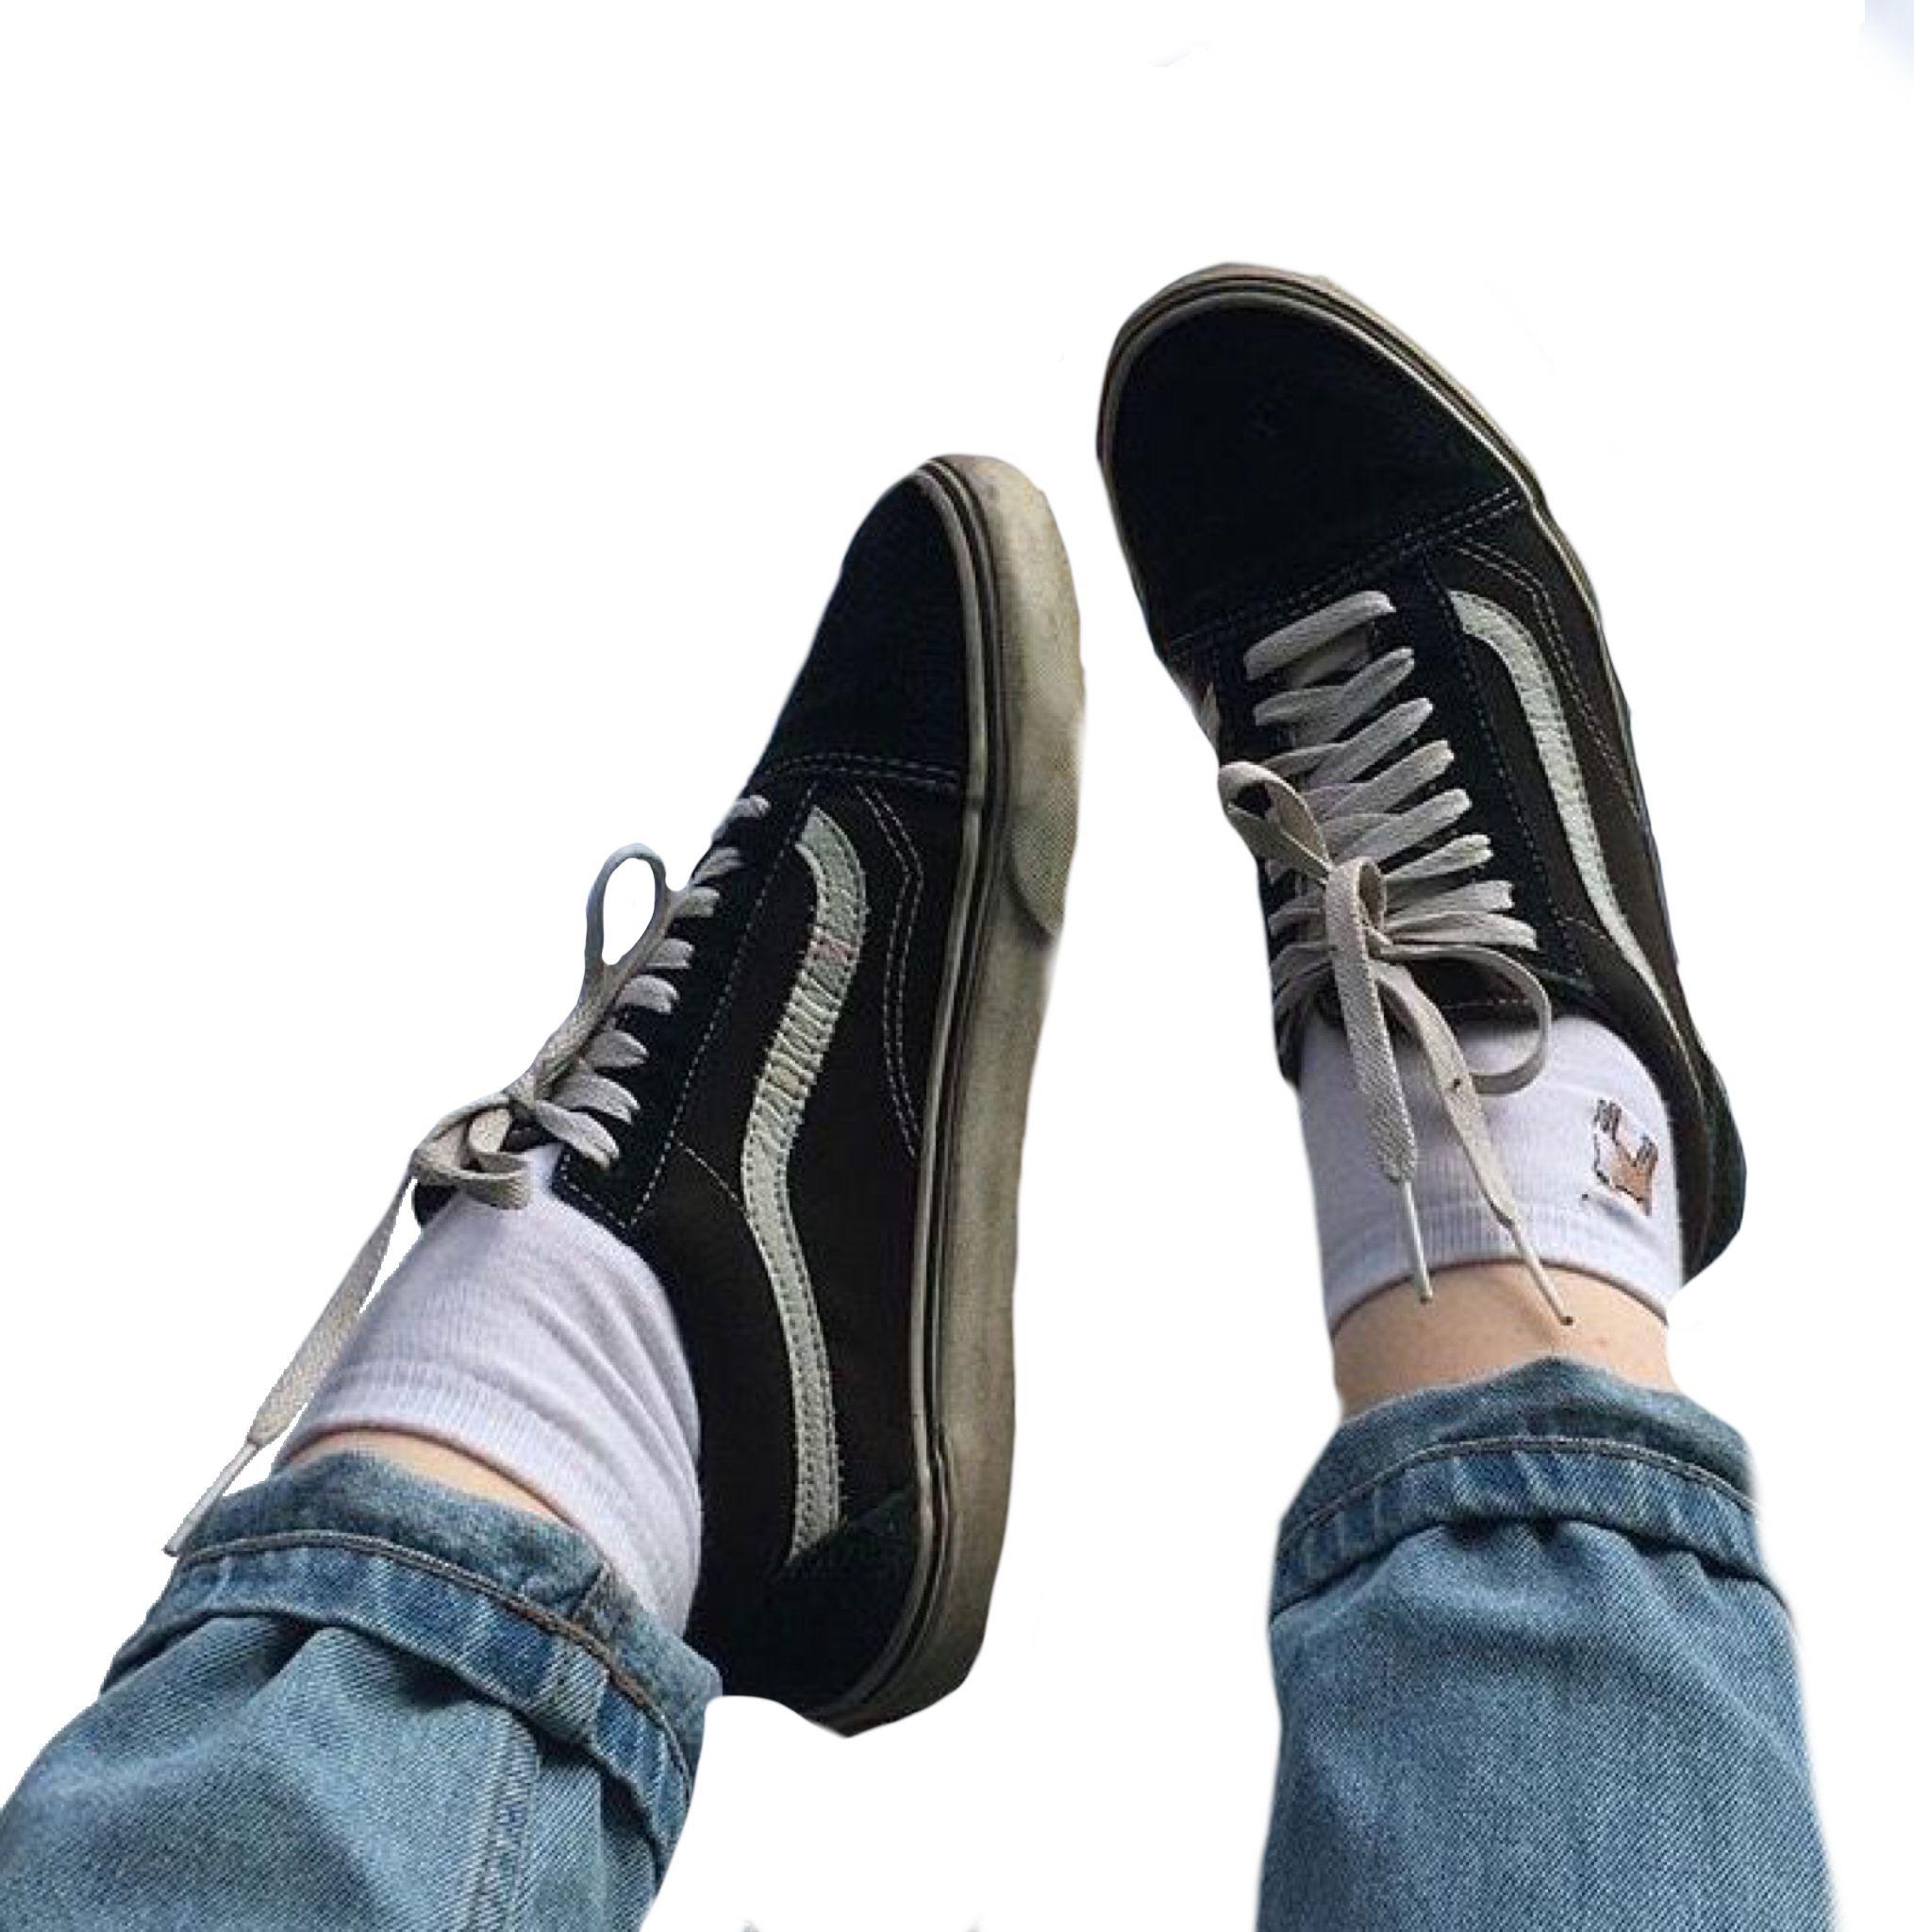 263d4ea6408 Vans black blue polyvore moodboard filler sneakers legs